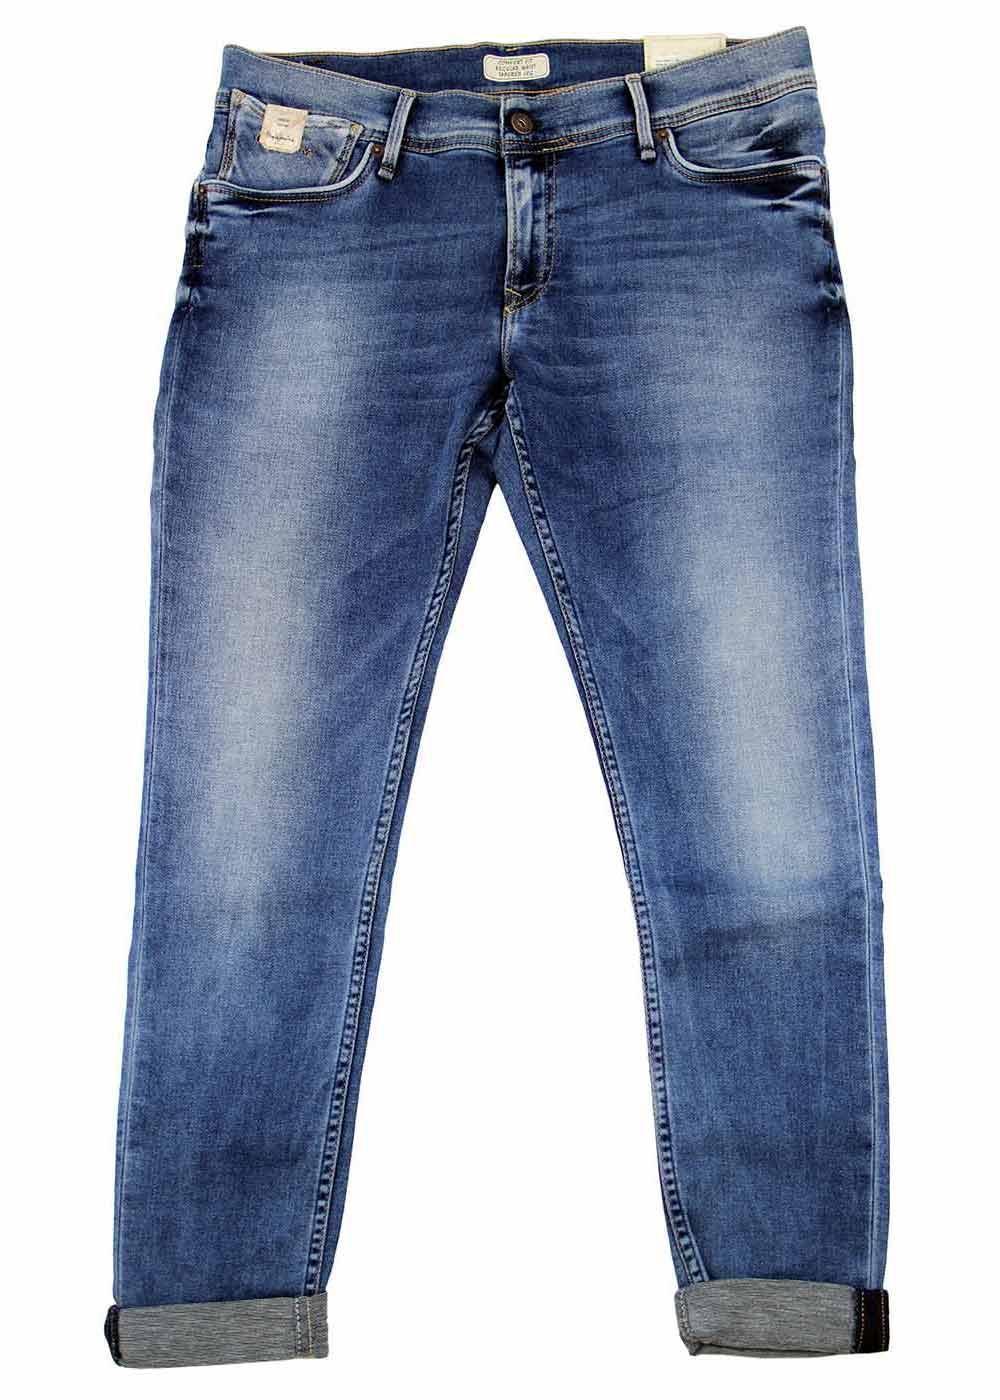 Joey PEPE Retro 1970s Turn Up Boyfriend Fit Jeans